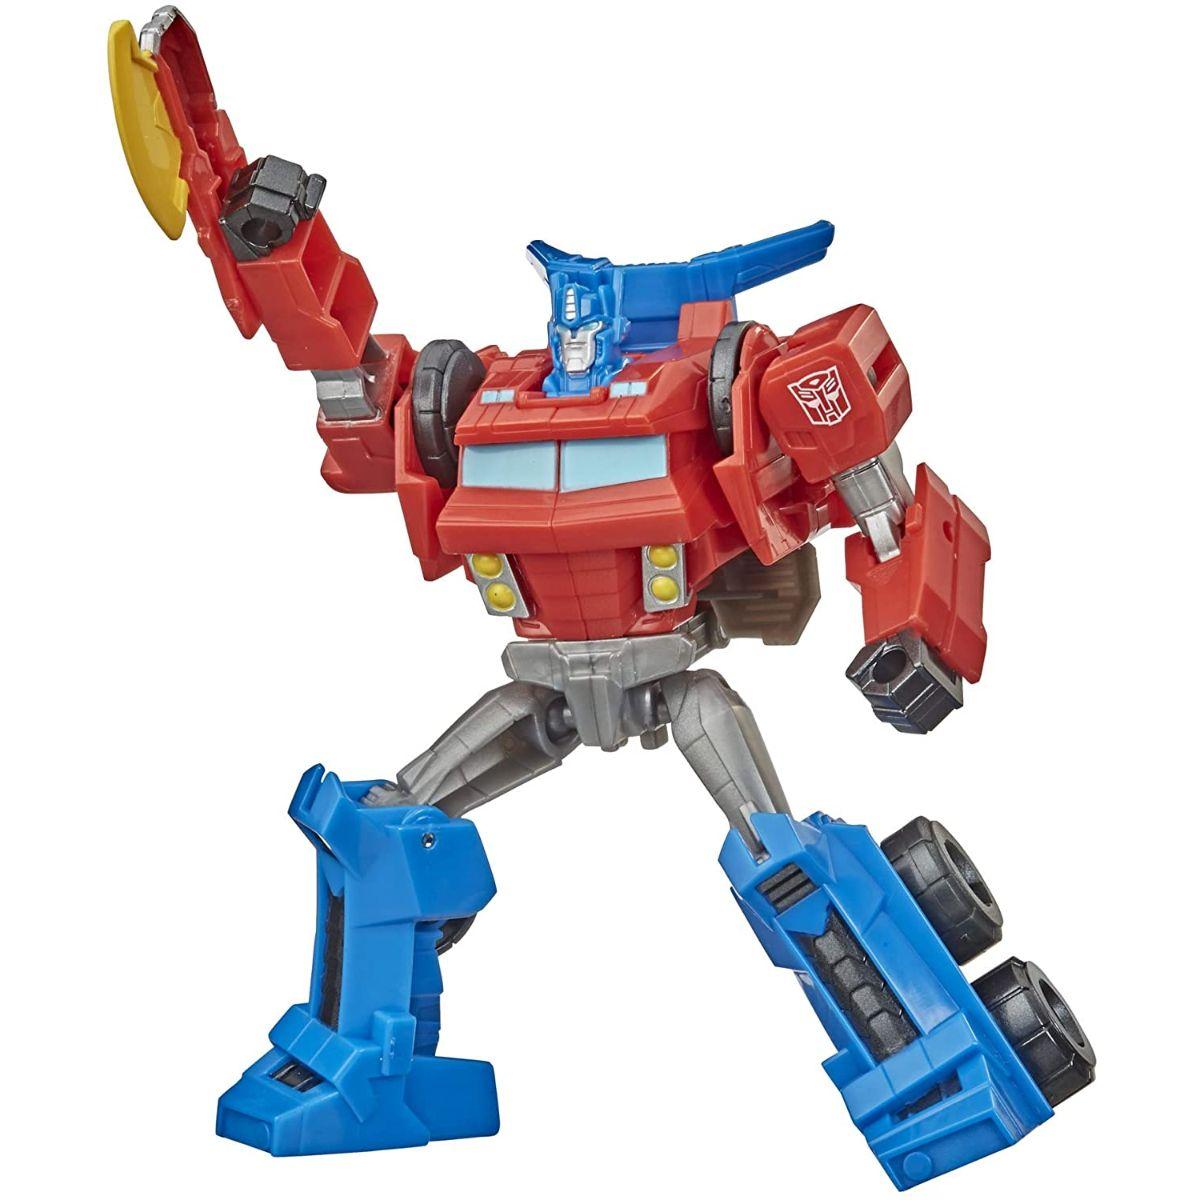 Figurina Transformers Cyberverse Action Attackers Warrior, Optimus Prime, E7090